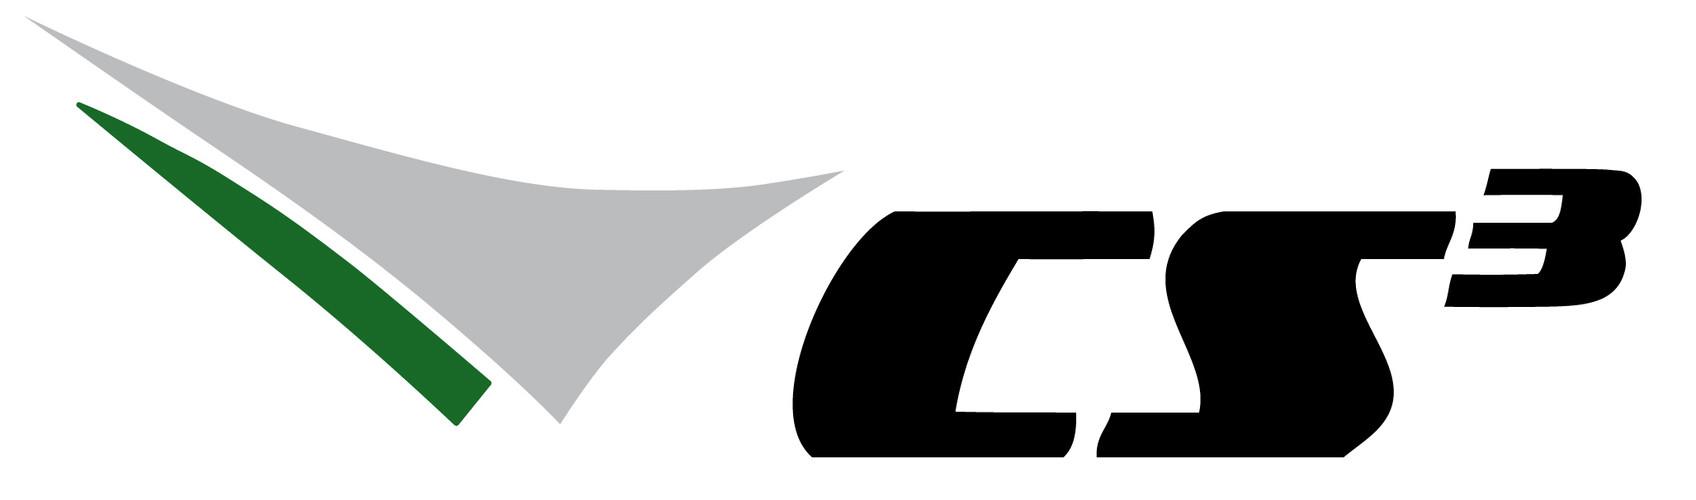 logo-cs3.jpg